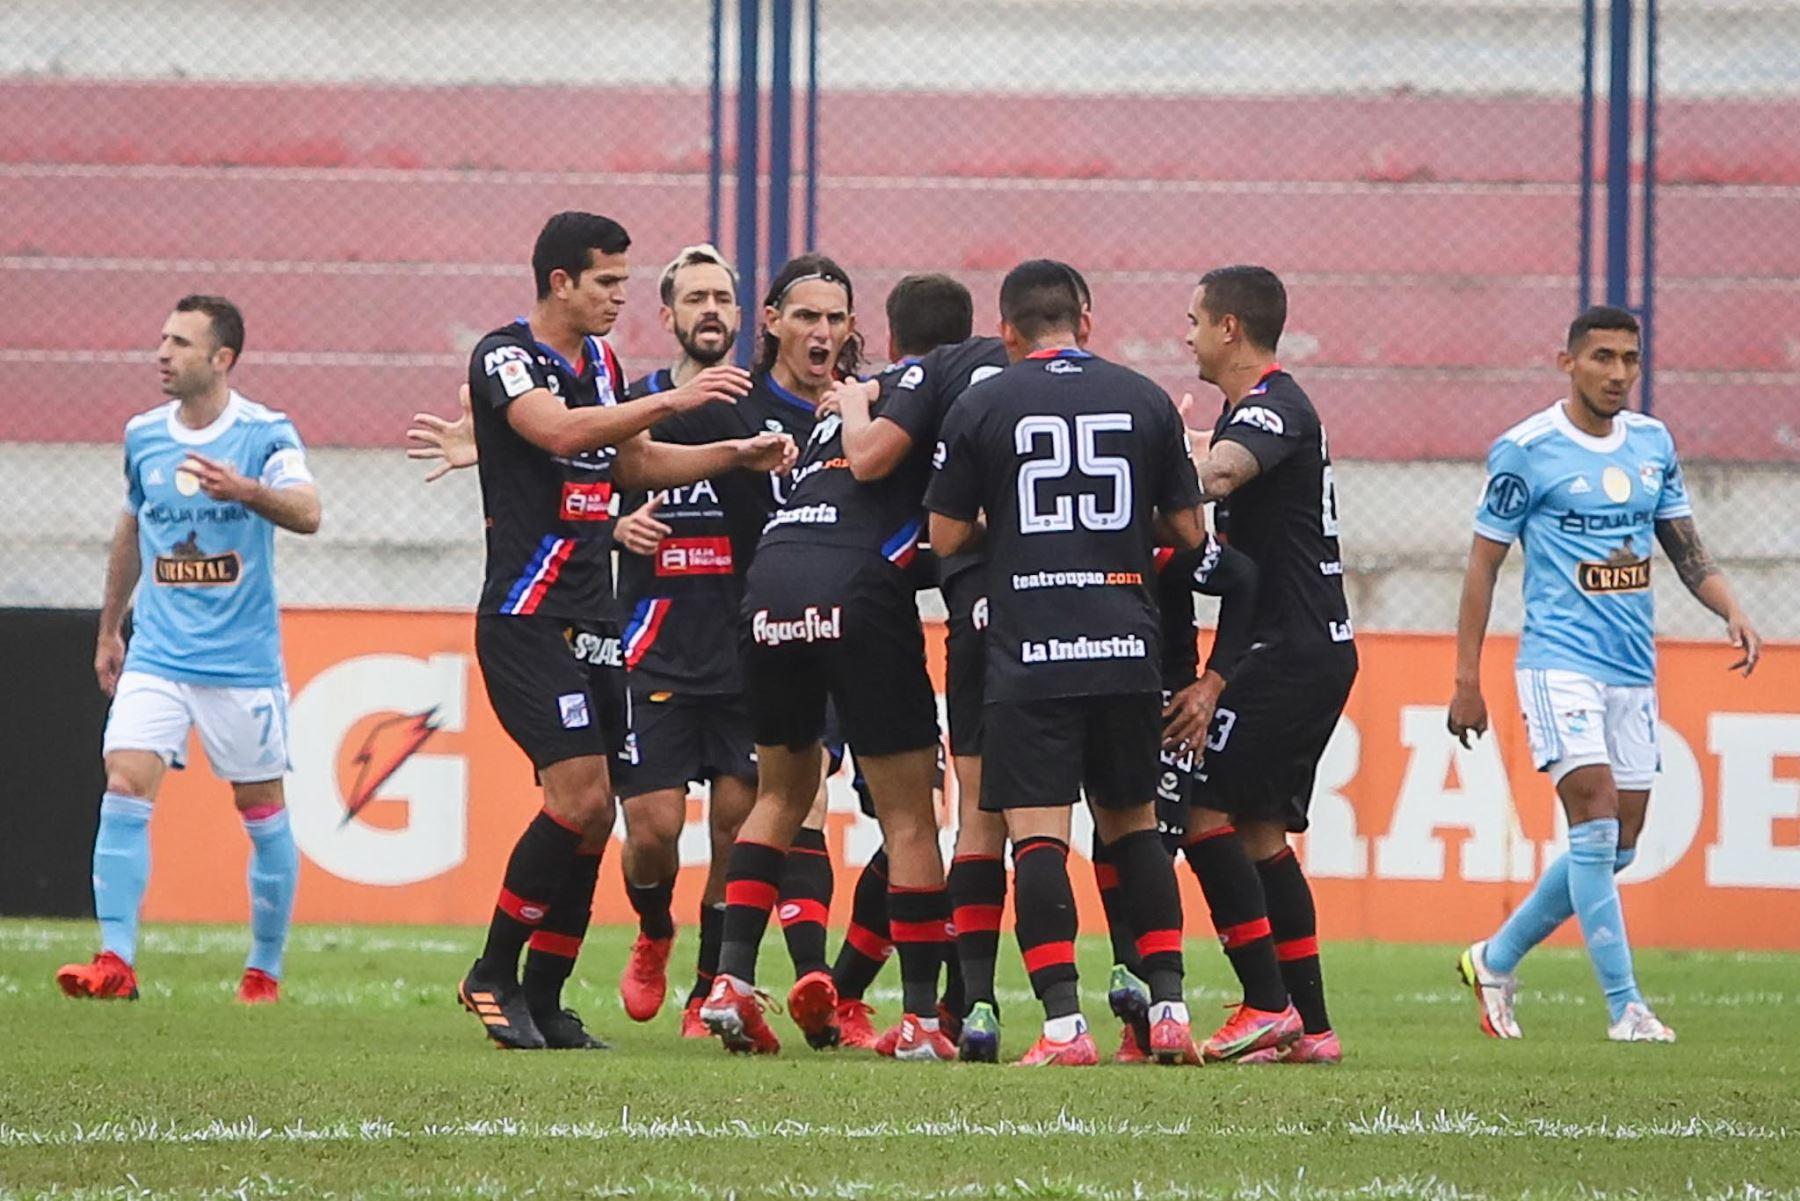 David Dioses (10') pone el primero para Manucci. Carlos Manucci derrotó 3-1 a Sporting Cristal por la Fase 2 de la Liga 1. Foto: FPF